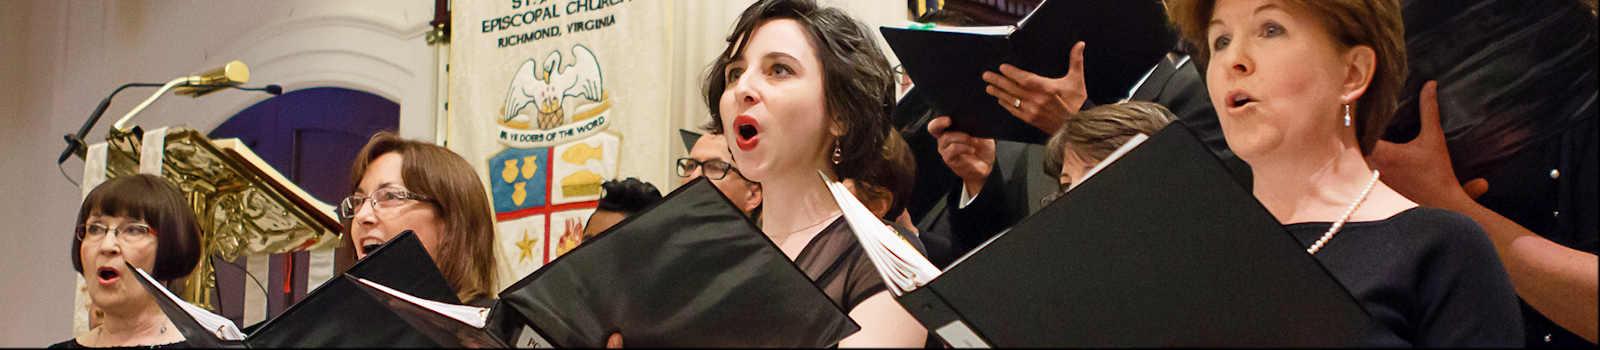 St. James's Choir in concert